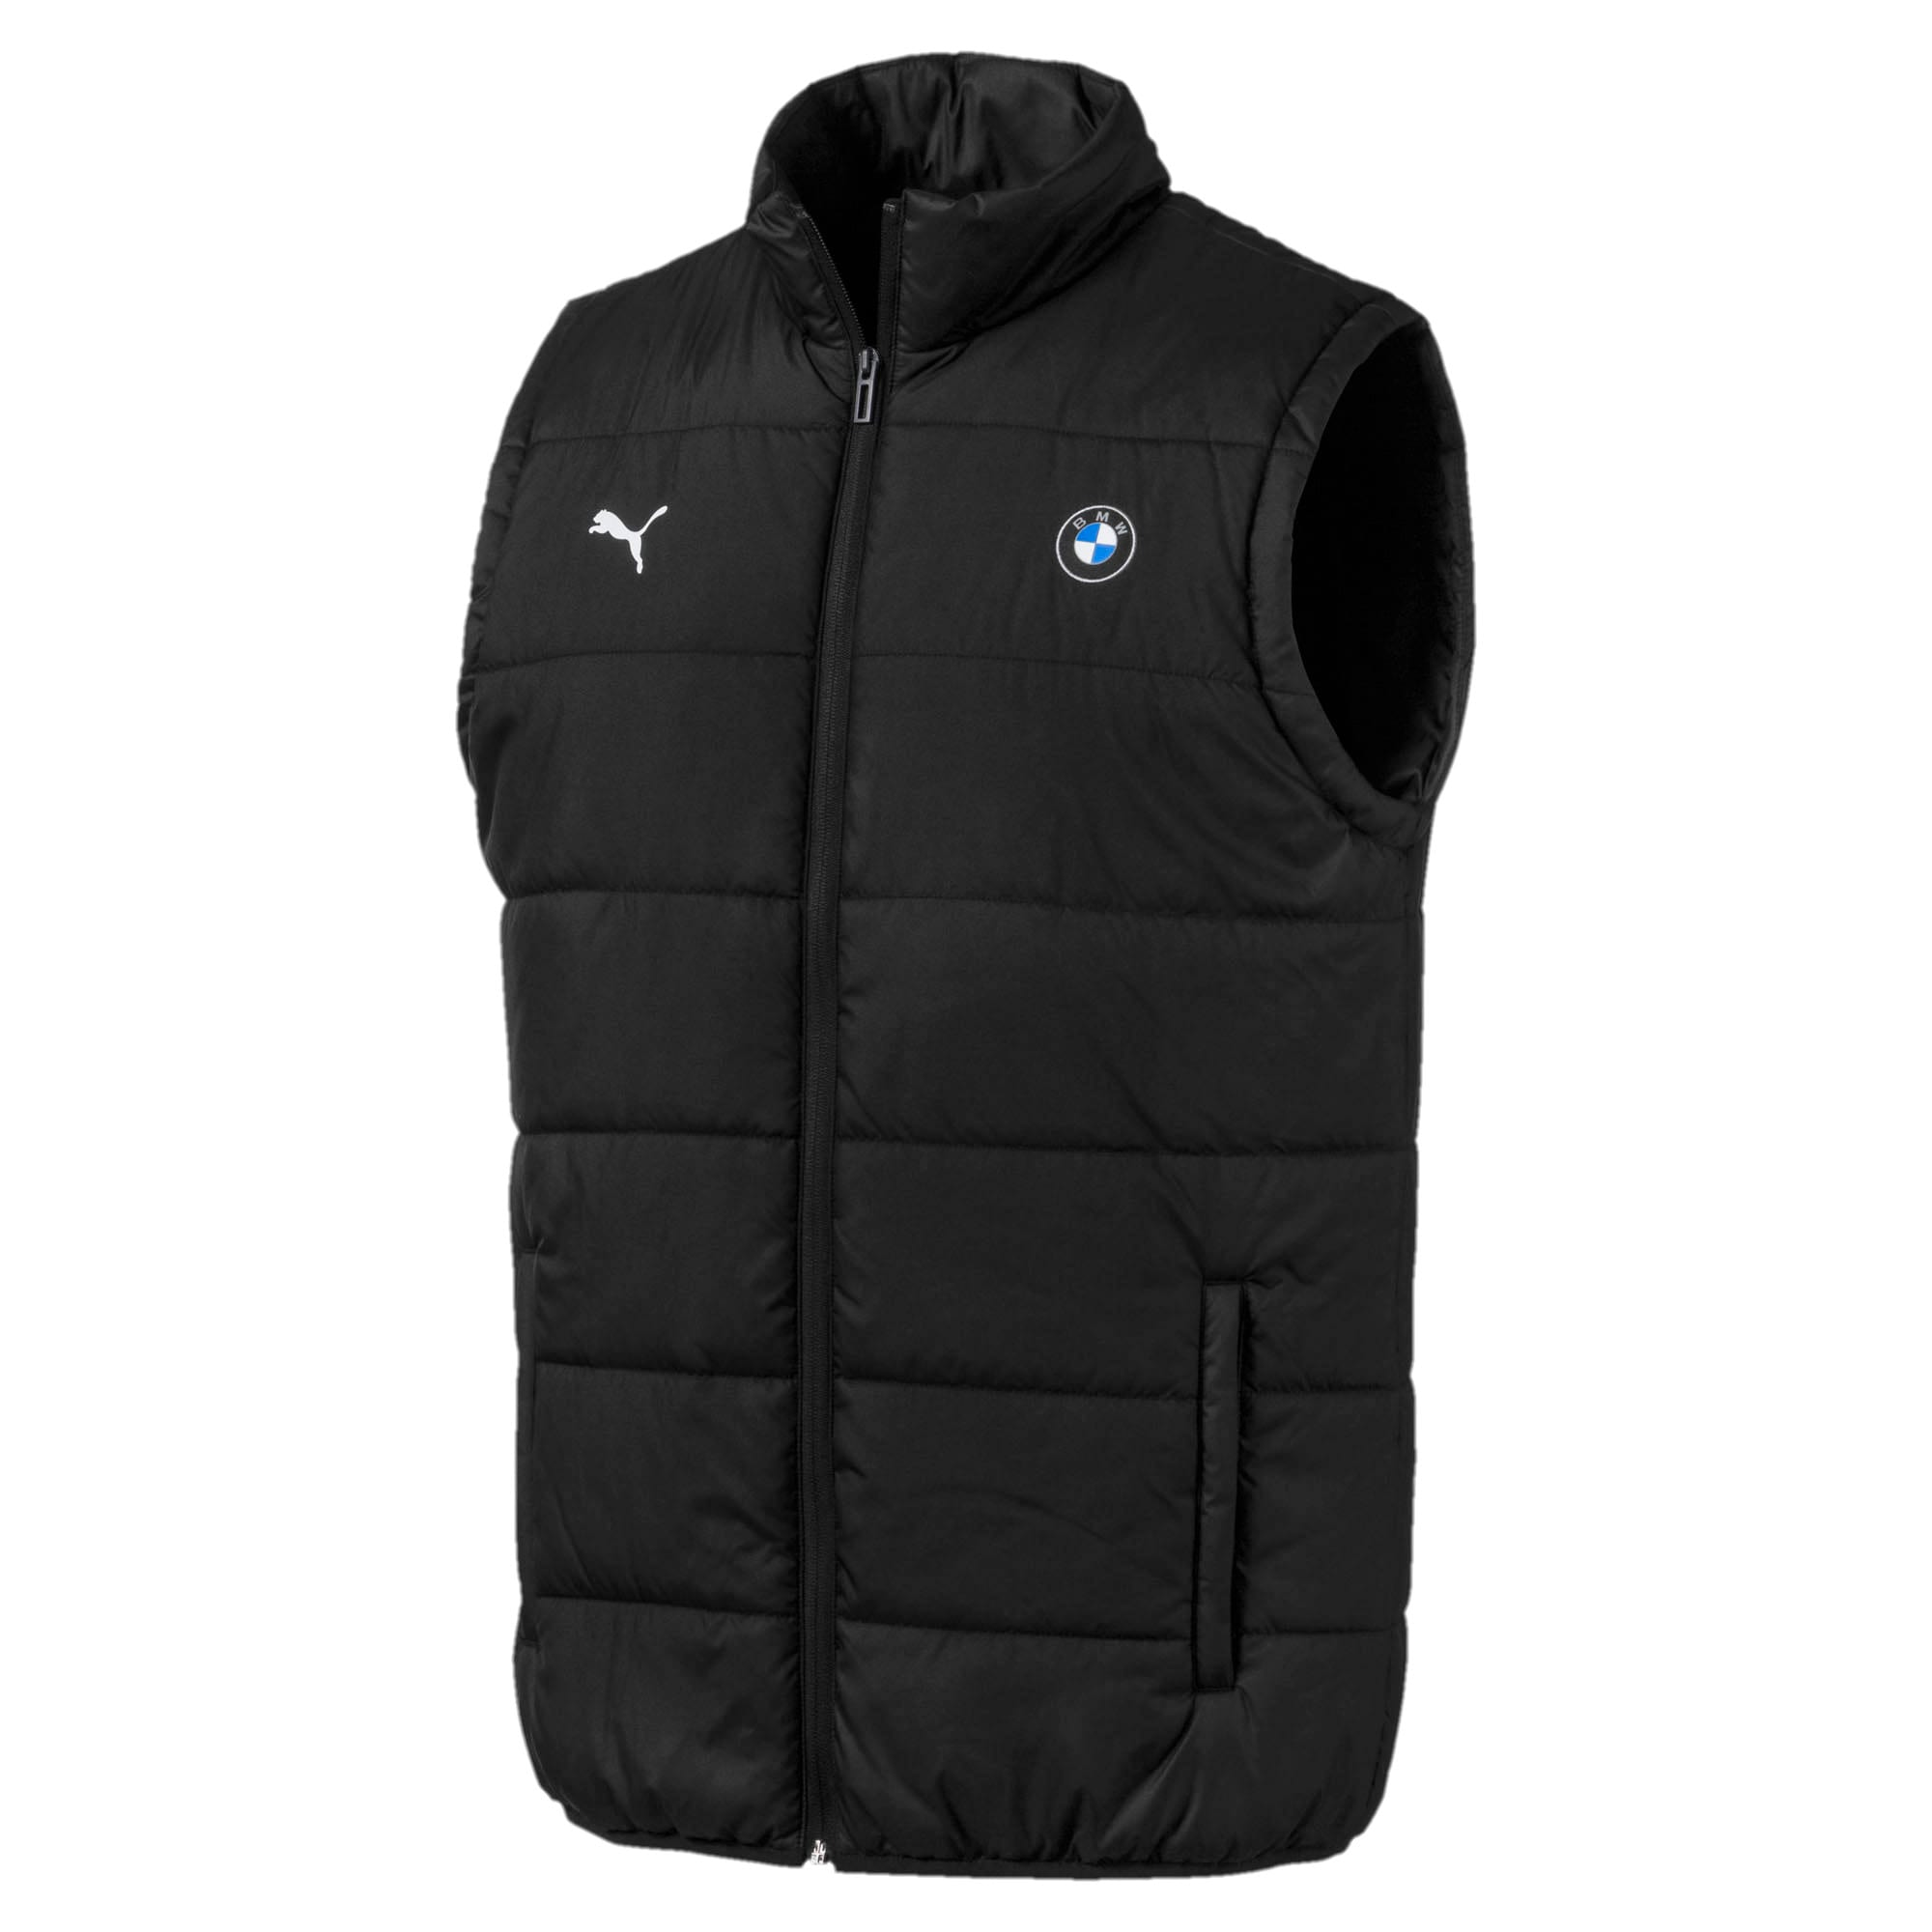 Thumbnail 5 of BMW M Motorsports Men's Padded Vest, Puma Black, medium